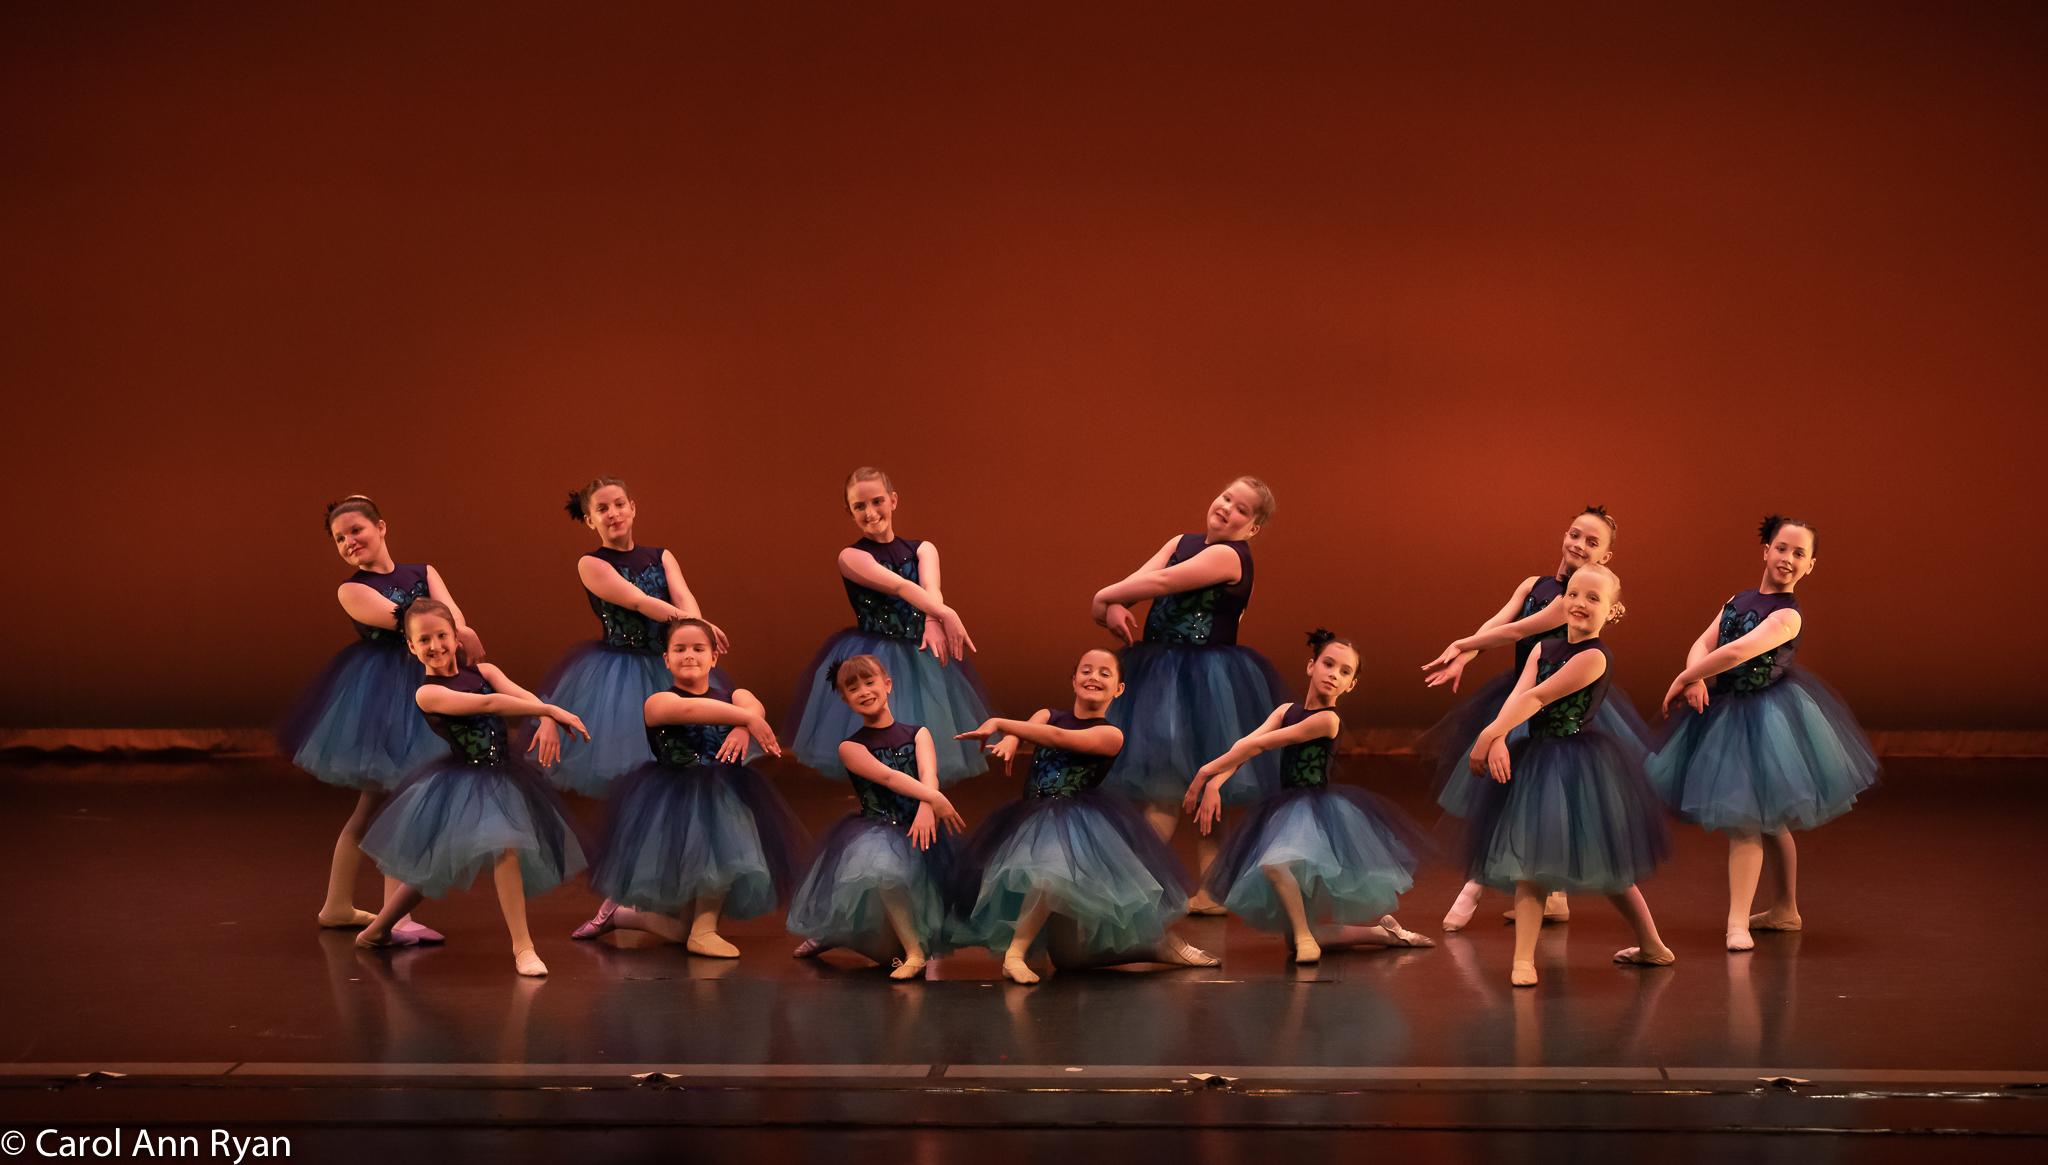 2019_06_06-Dance Recital37048-1.jpg